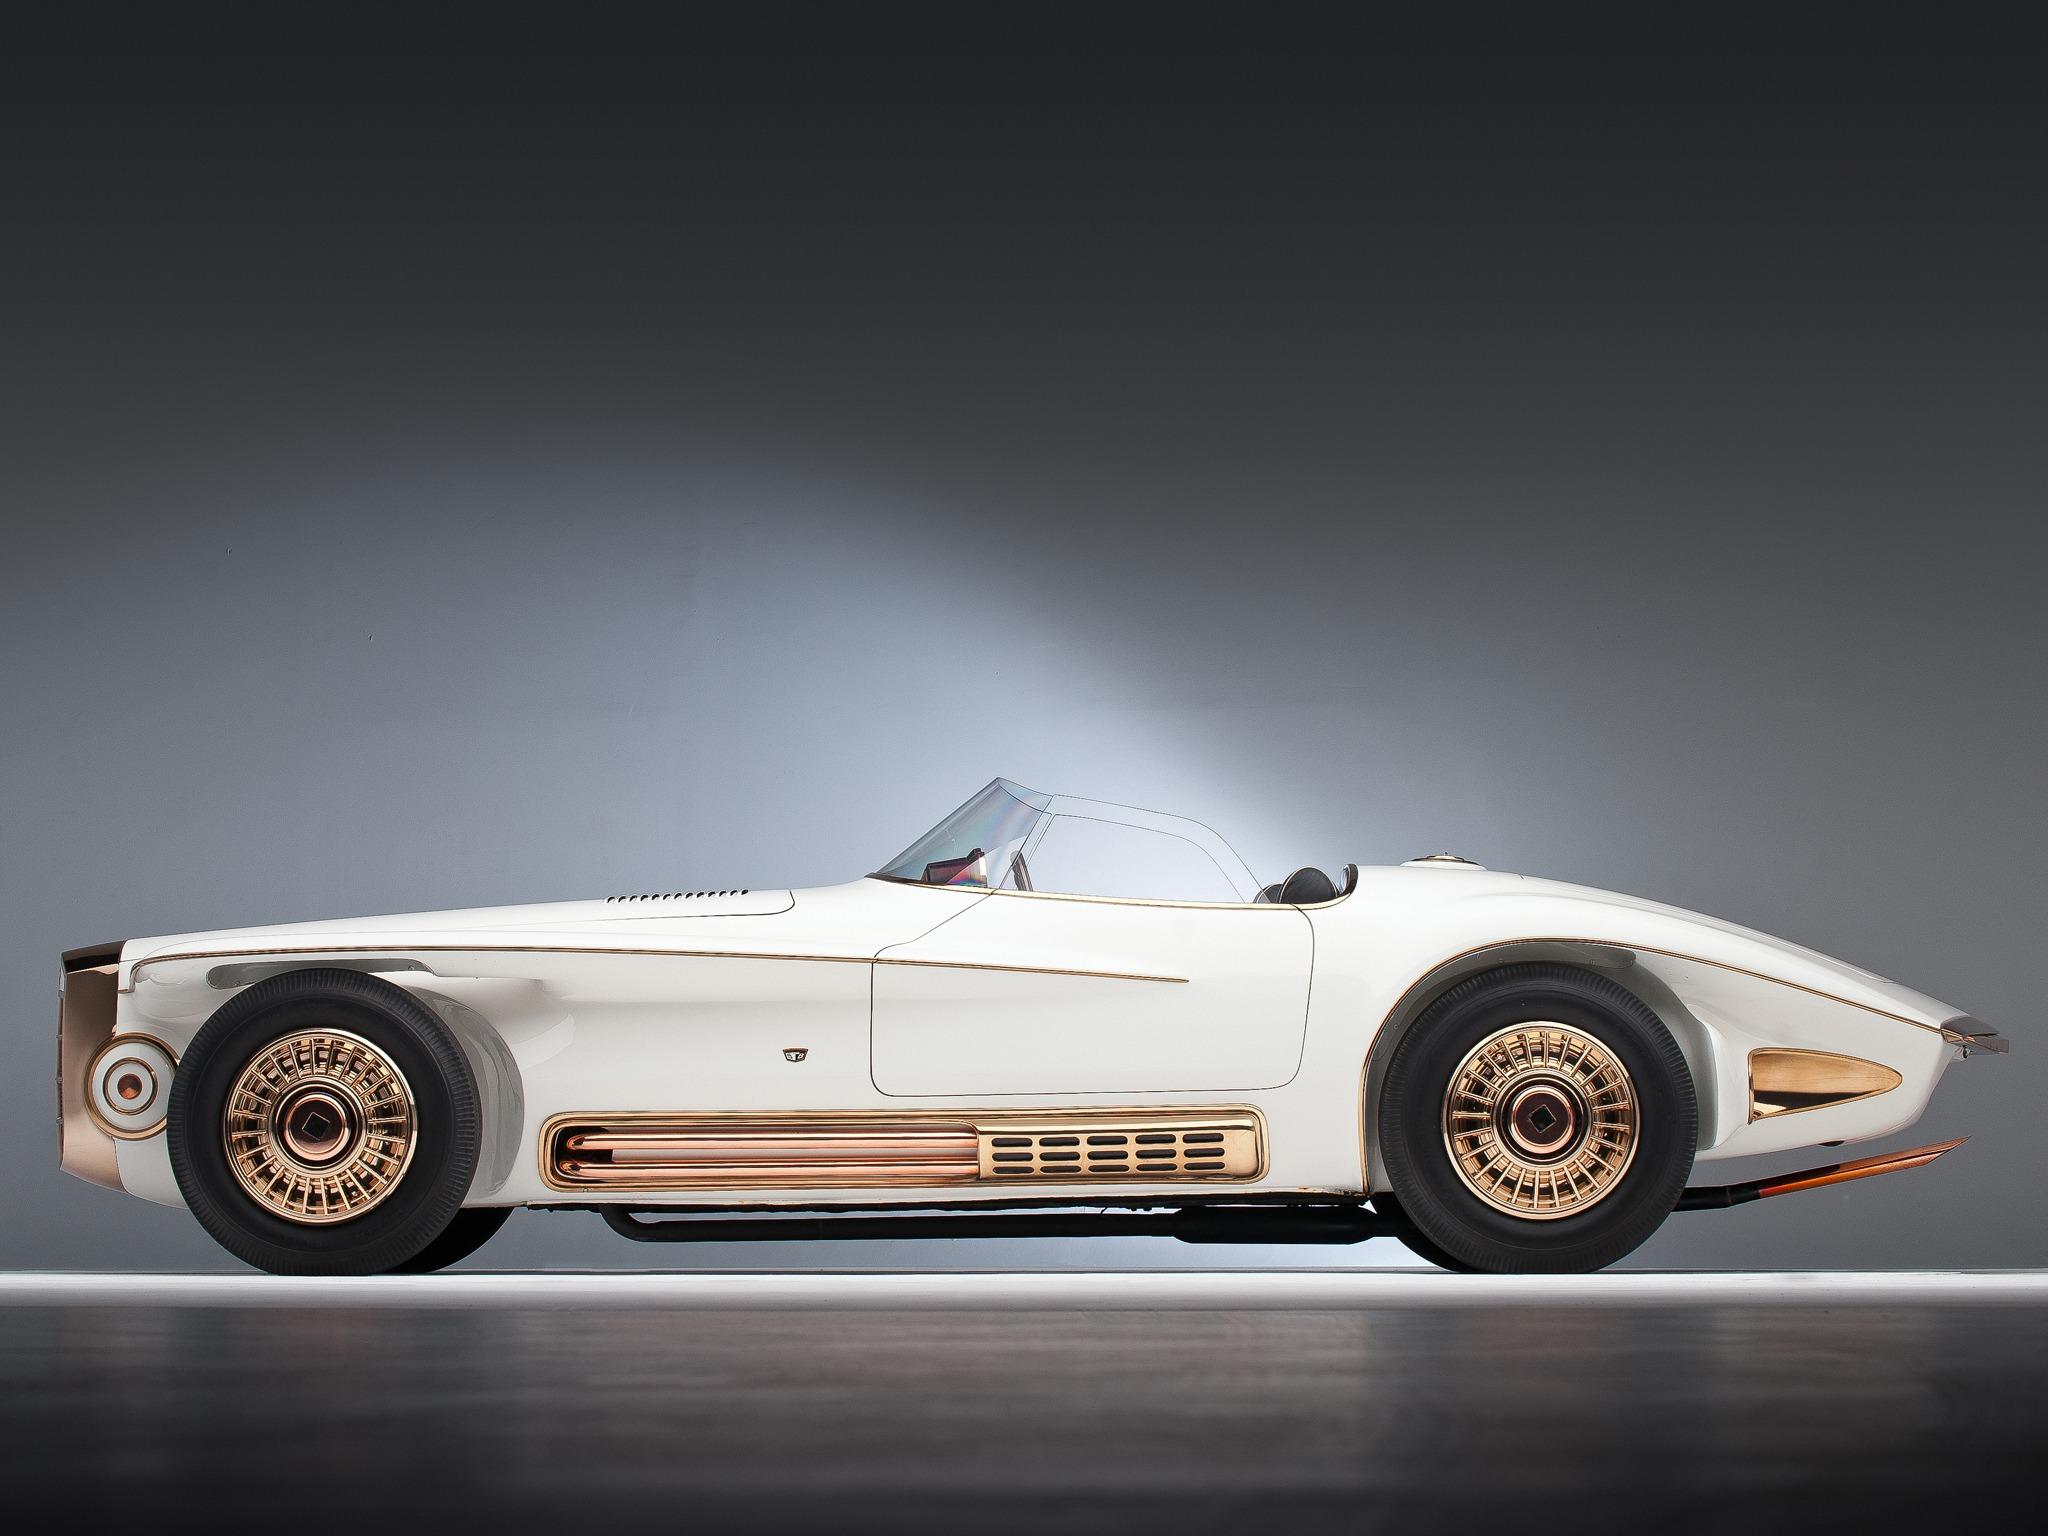 1965_Mercer_Cobra_Roadster_by_Virgil_Exner_03